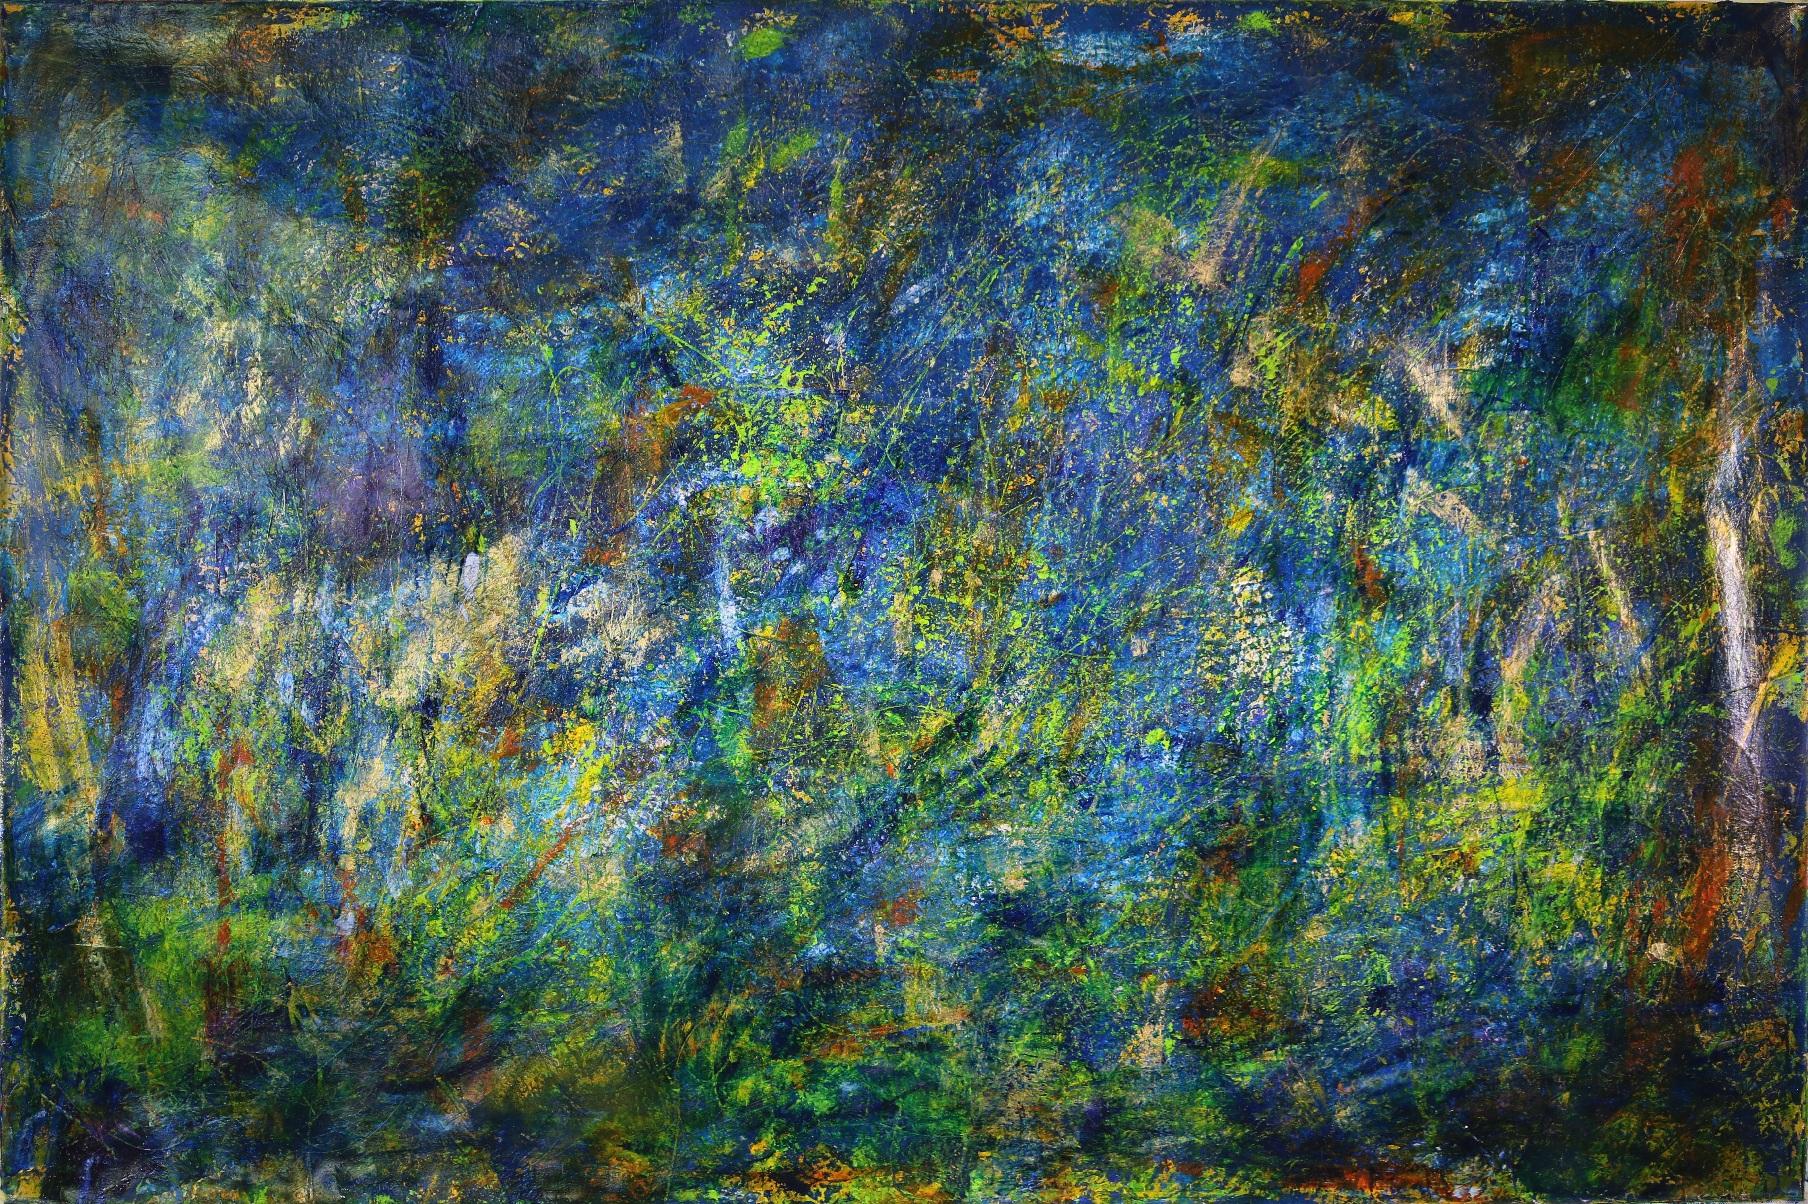 Tropical Spectra by Nestor Toro